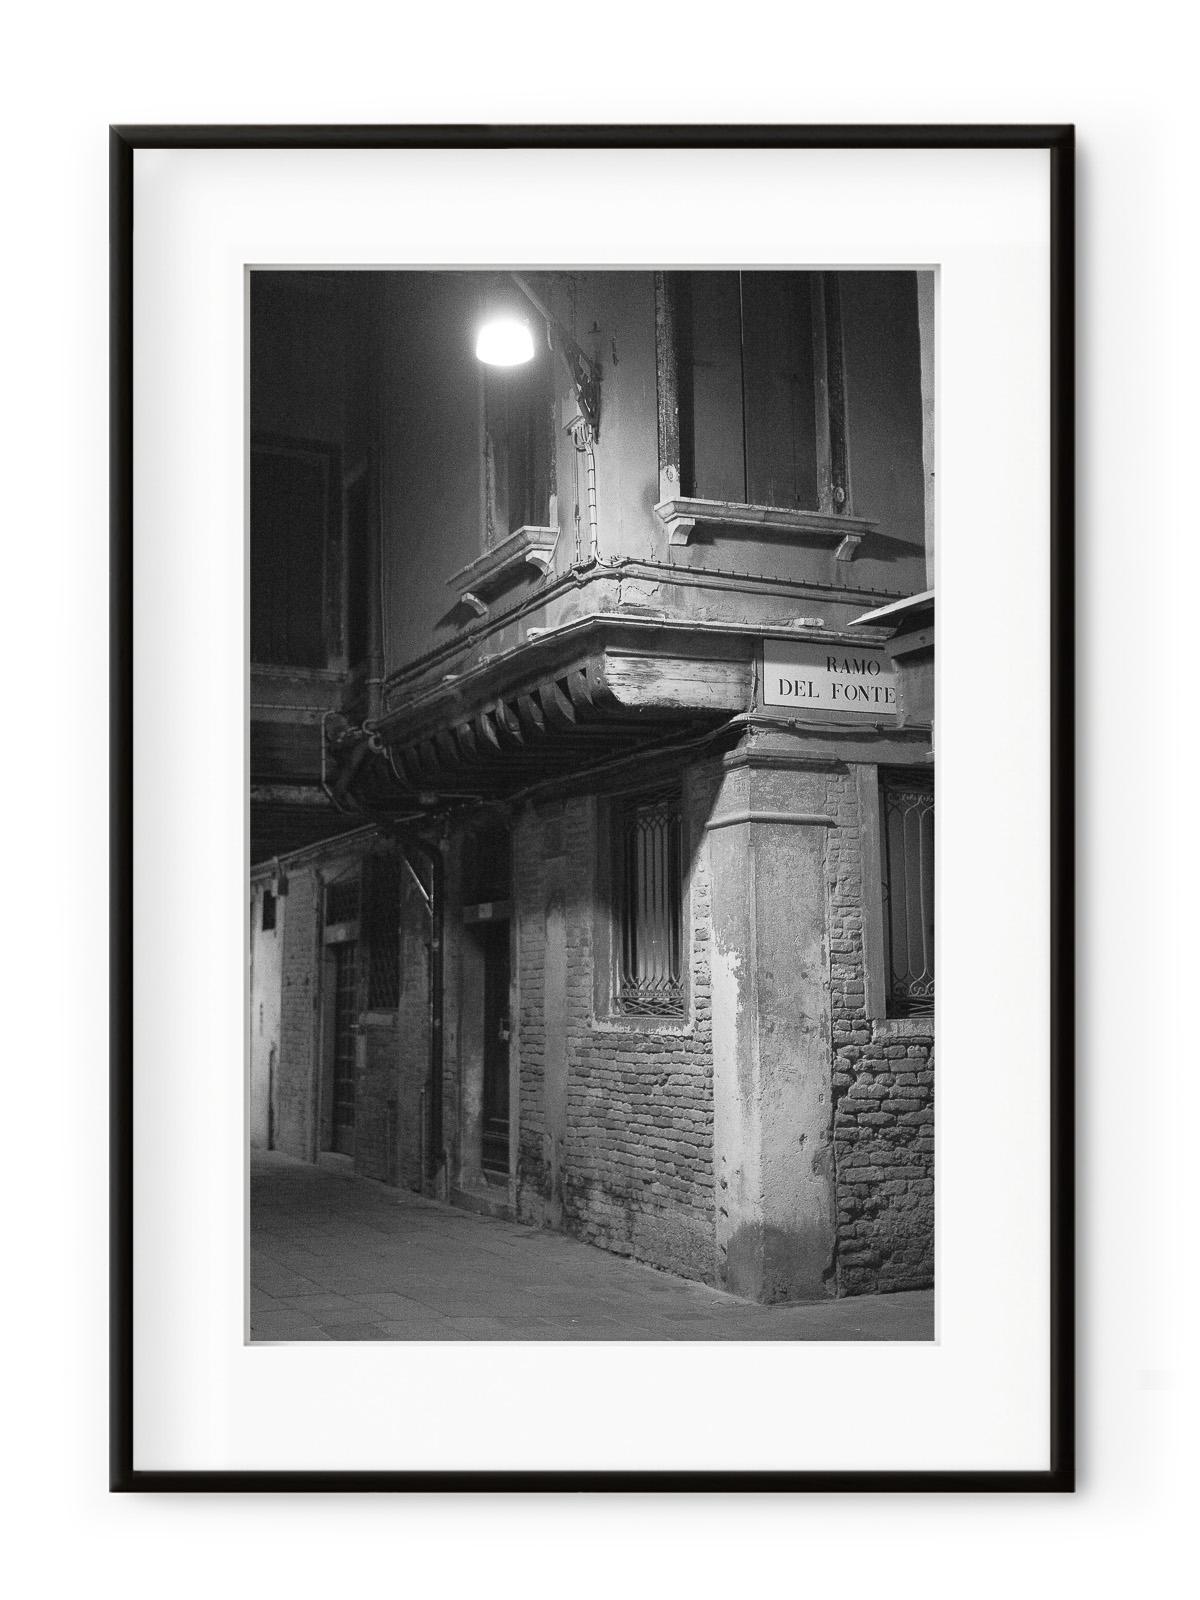 Tablou Venezia di Notte Ramo del Fonte Aluminium Noir